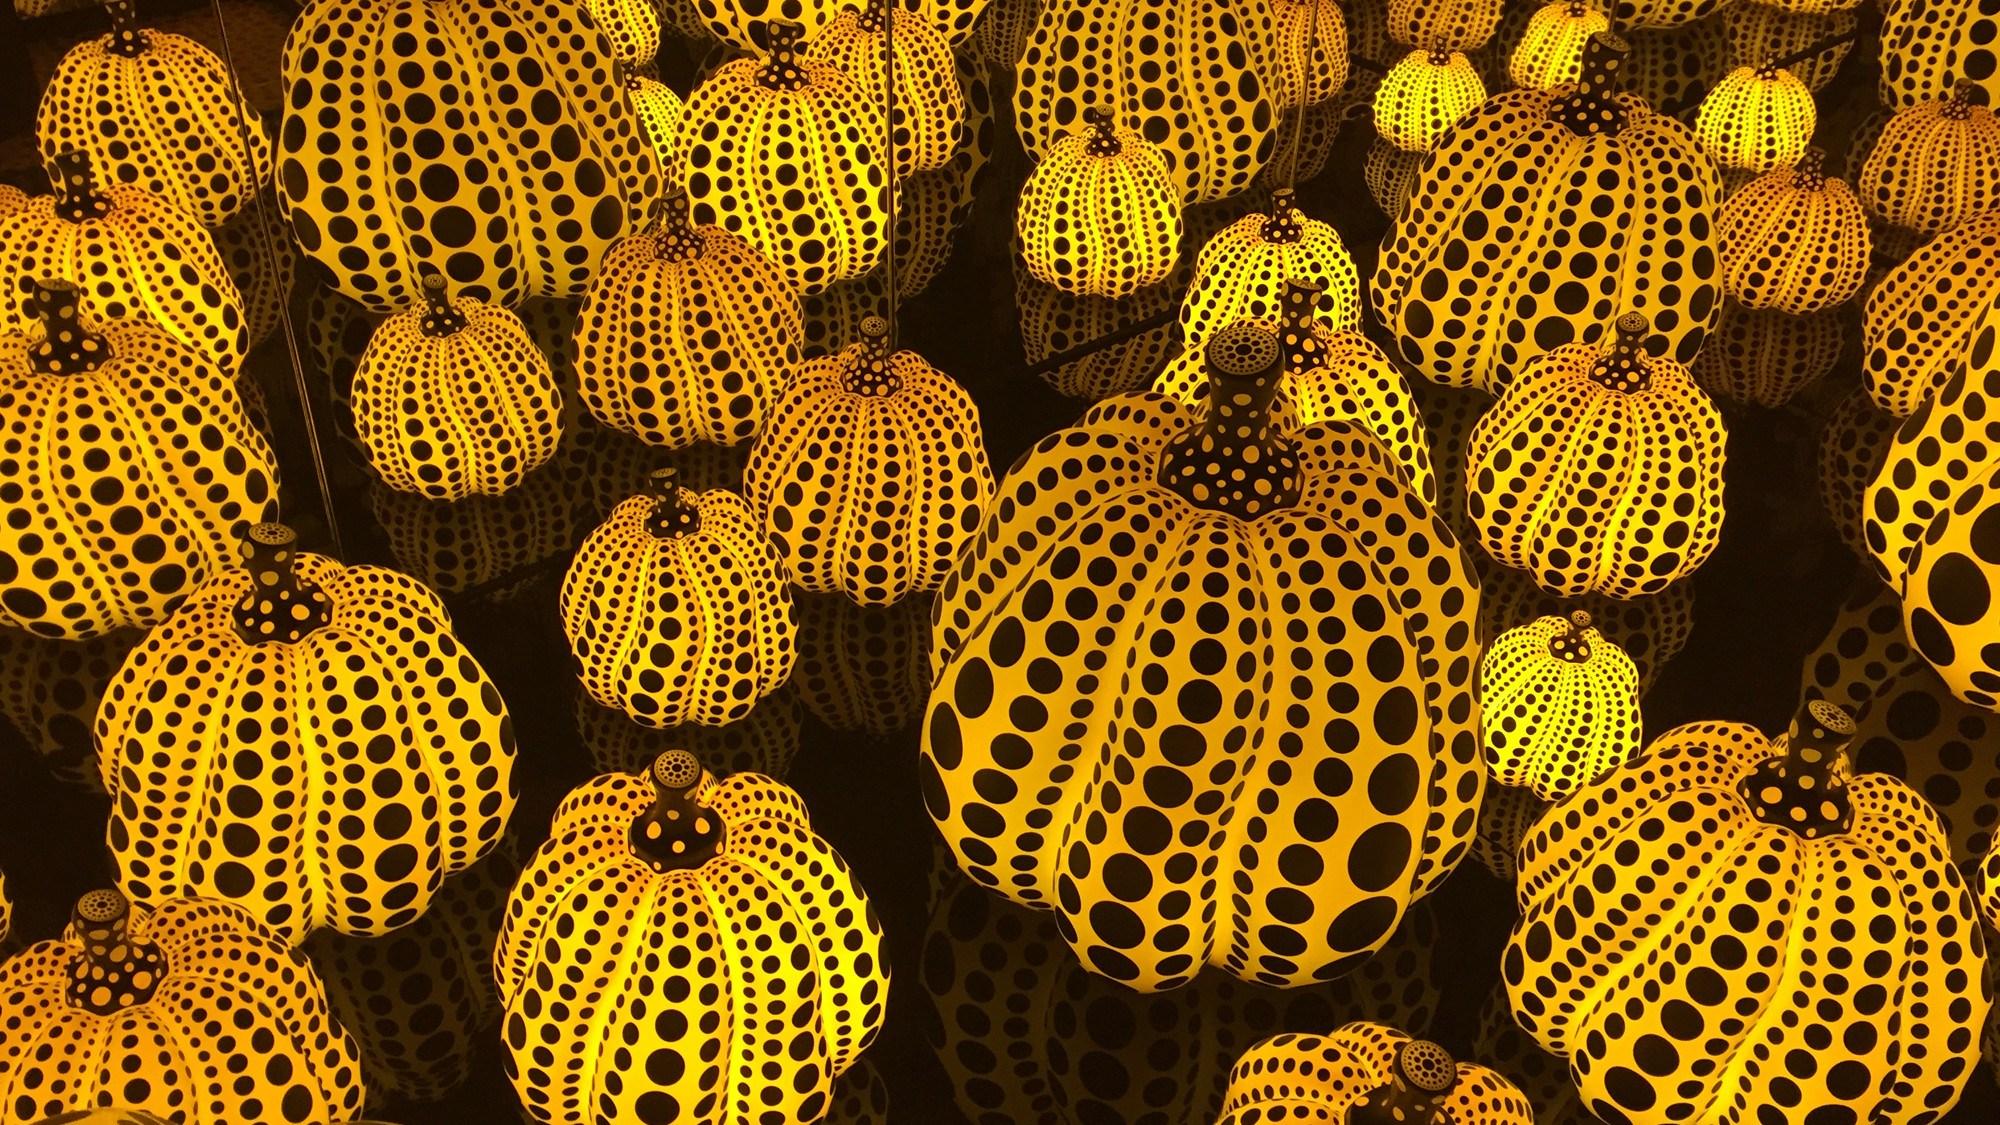 yayoi-kusama-infinity-mirror-room-pumpkins-dma-girlinchief